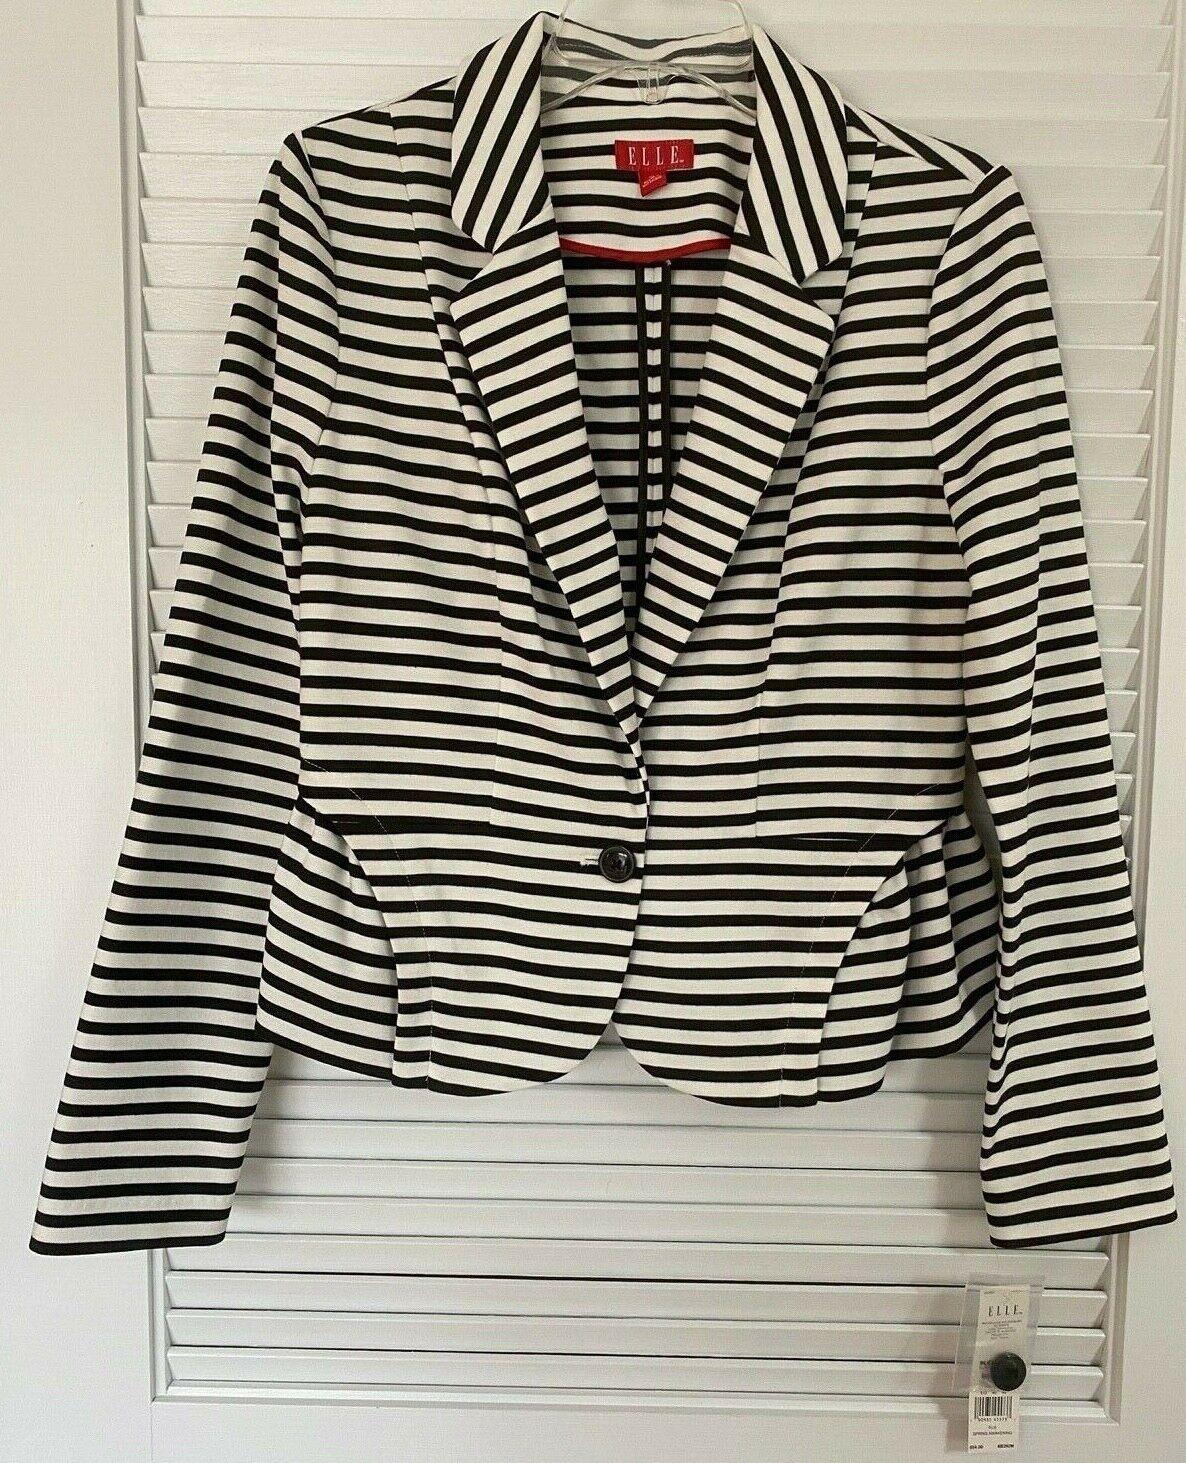 ELLE Striped Jacket One Button Close Black White Women's Size Small M NEW